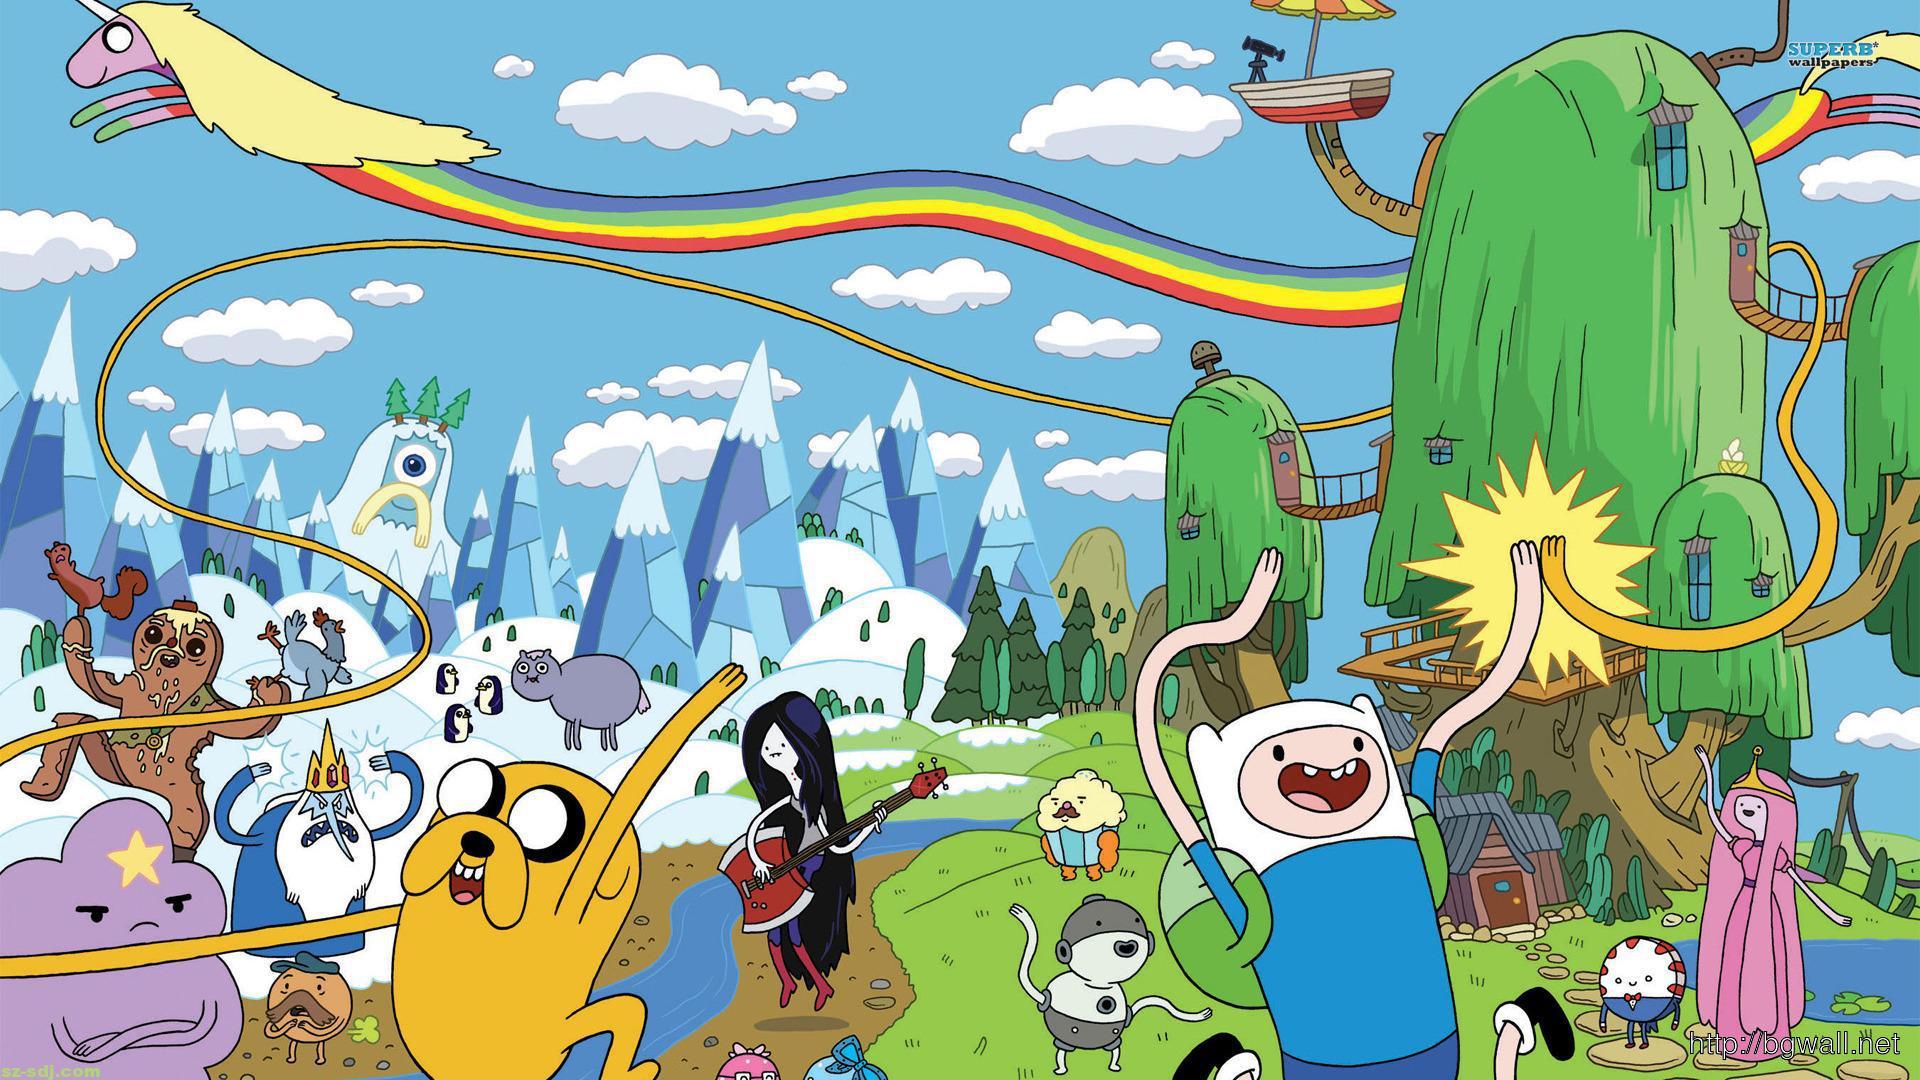 cartoon-adventure-time-wallpaper